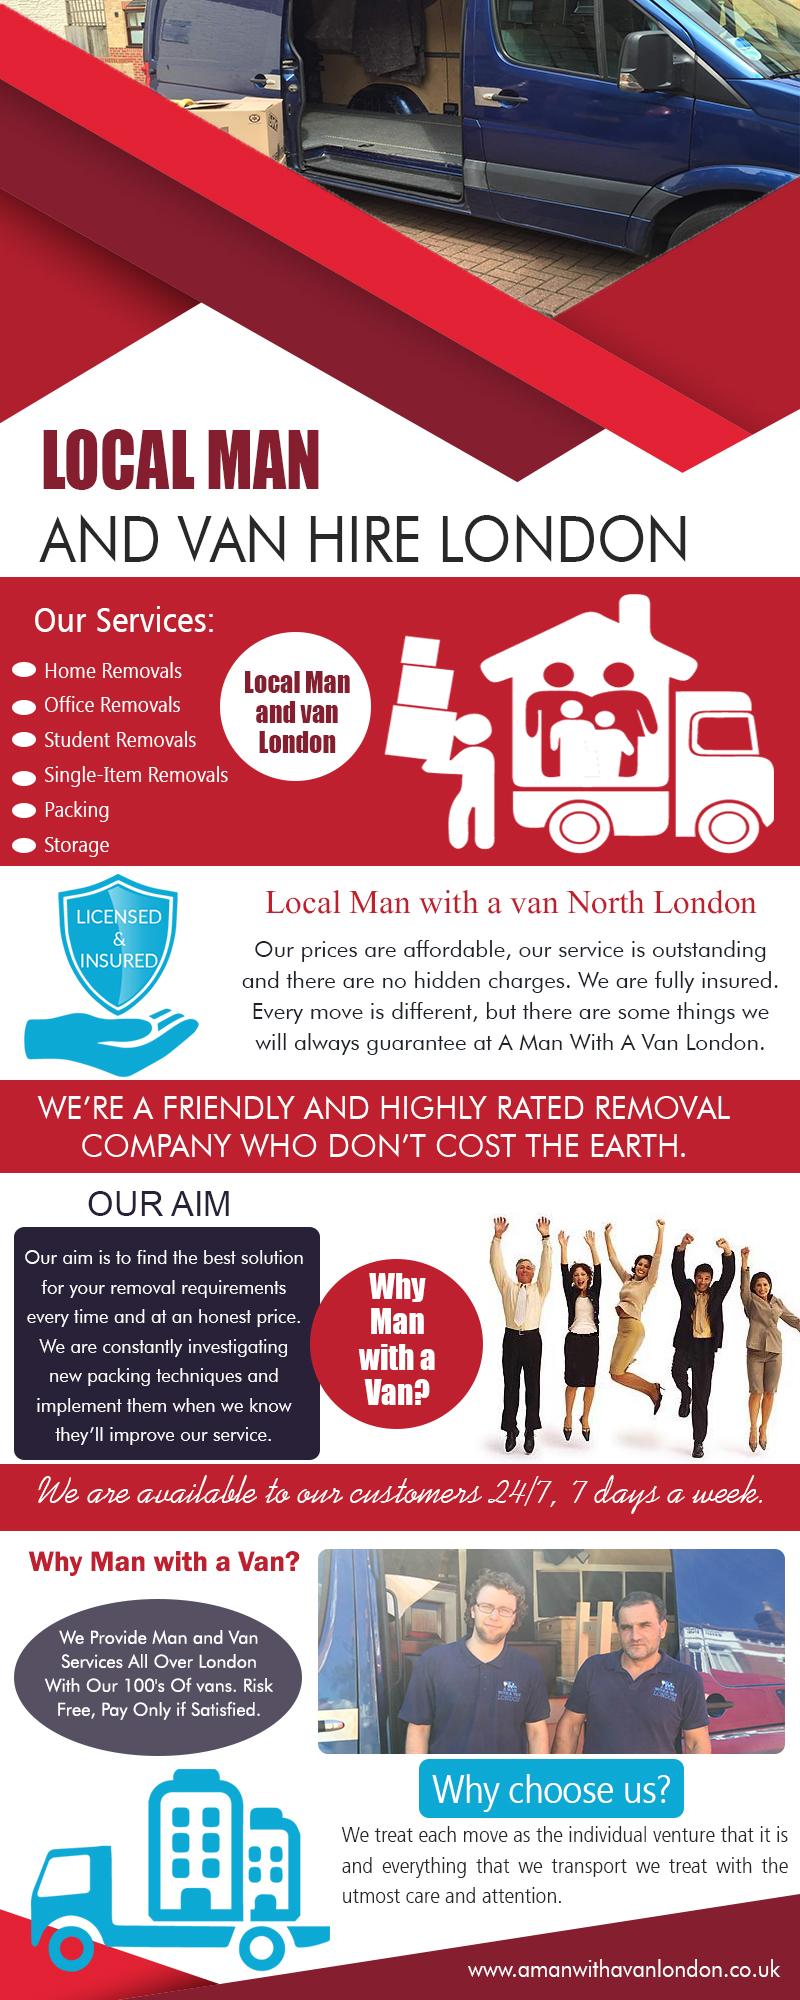 Local Man and van hire London|https://www.amanwithavanlondon.co.uk/